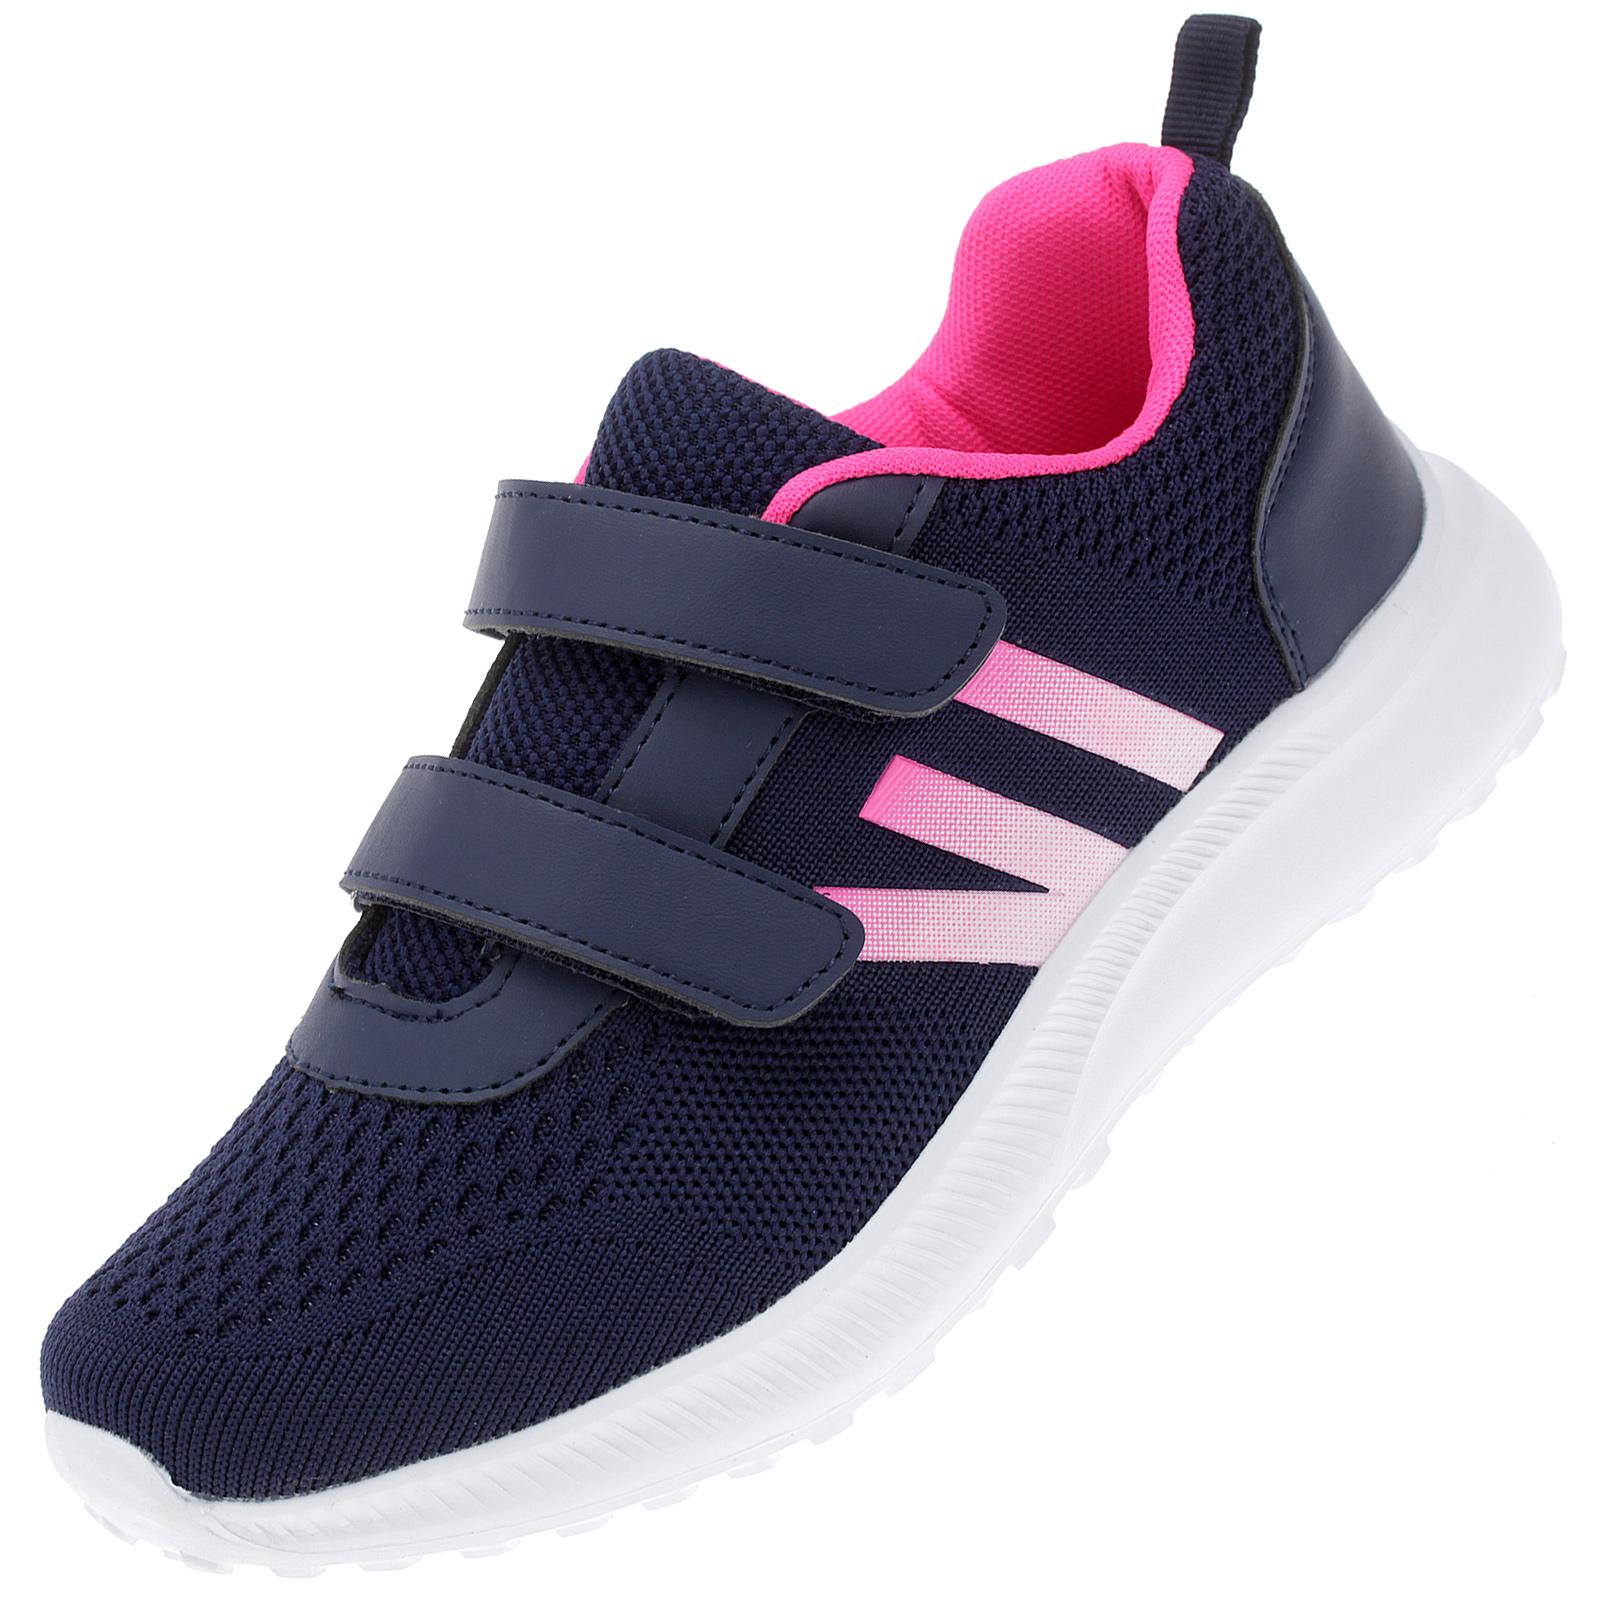 5. Blau Pink